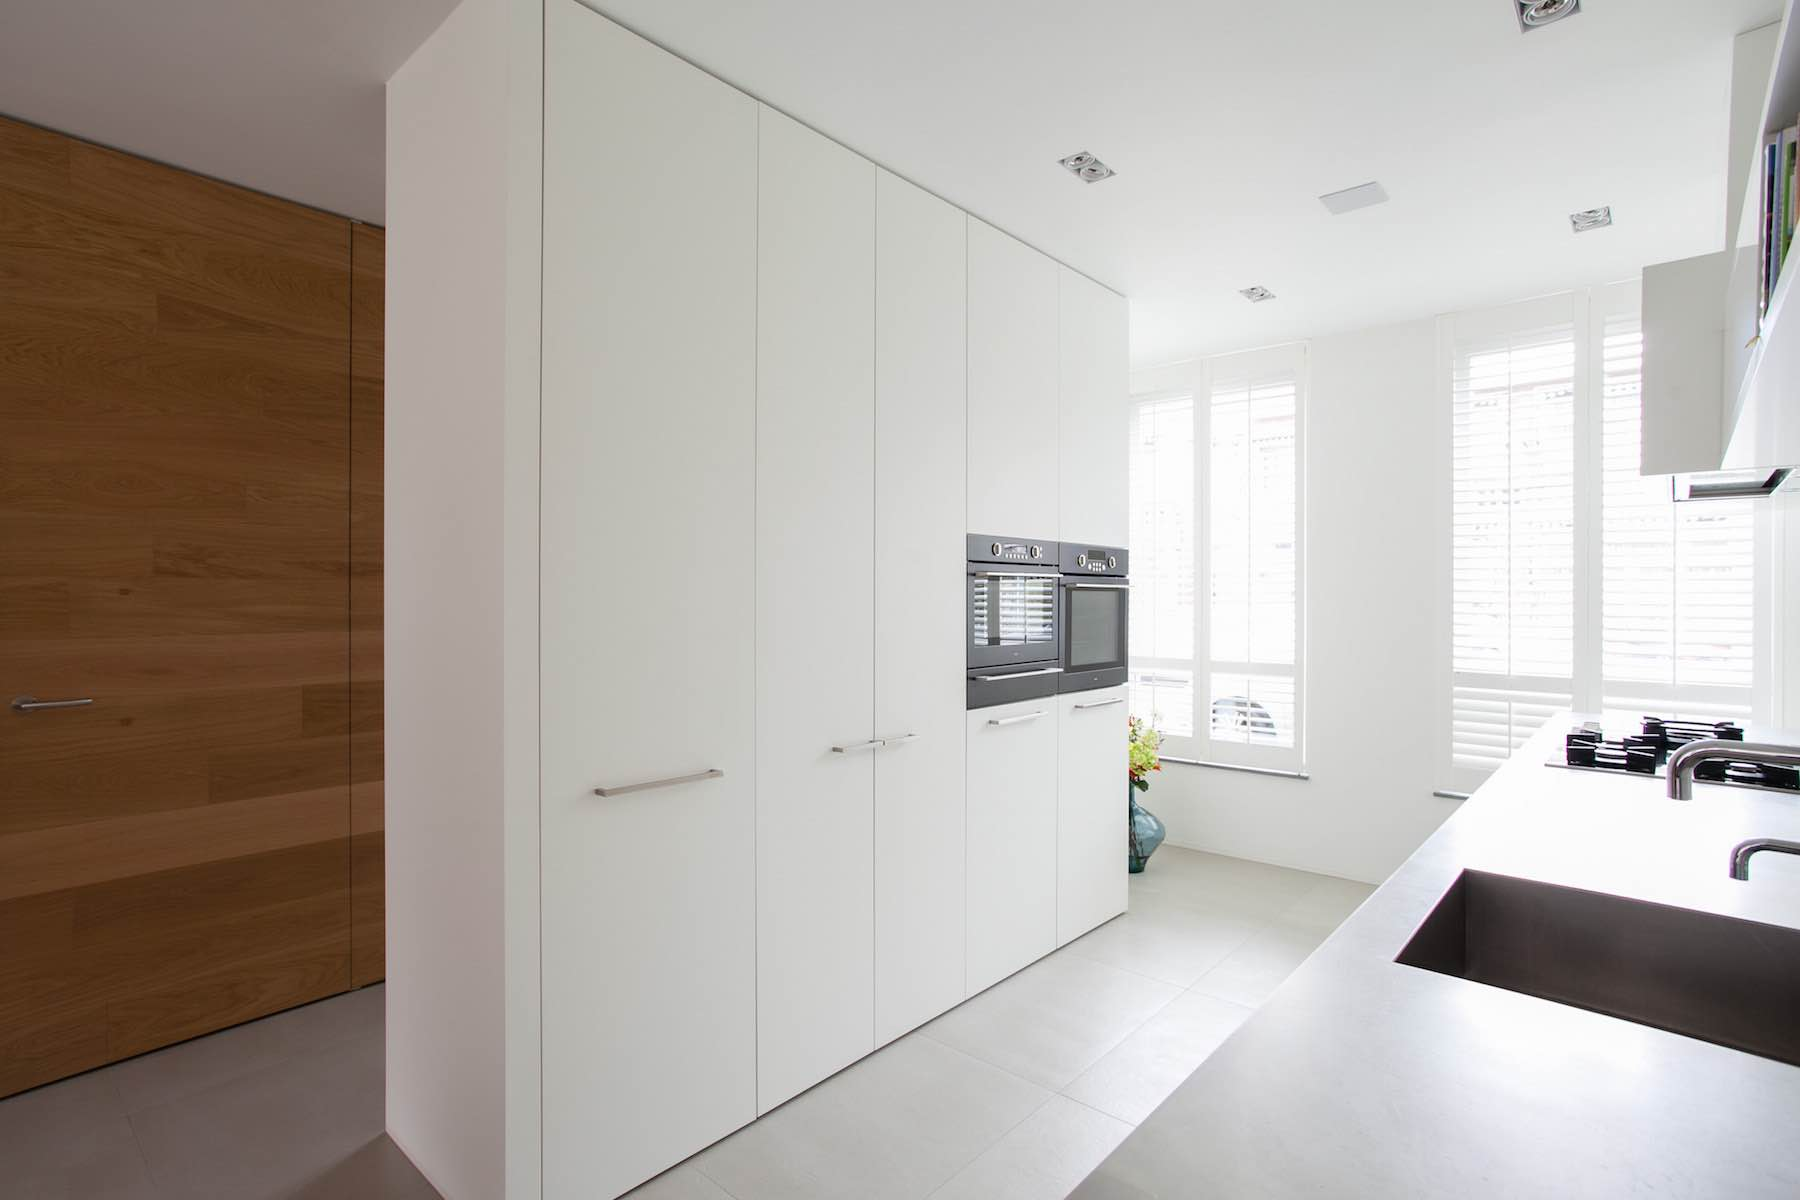 Keuken kastenwand top klik om te vergroten with keuken kastenwand gallery of referentie - Scheiding tussen twee kamers ...